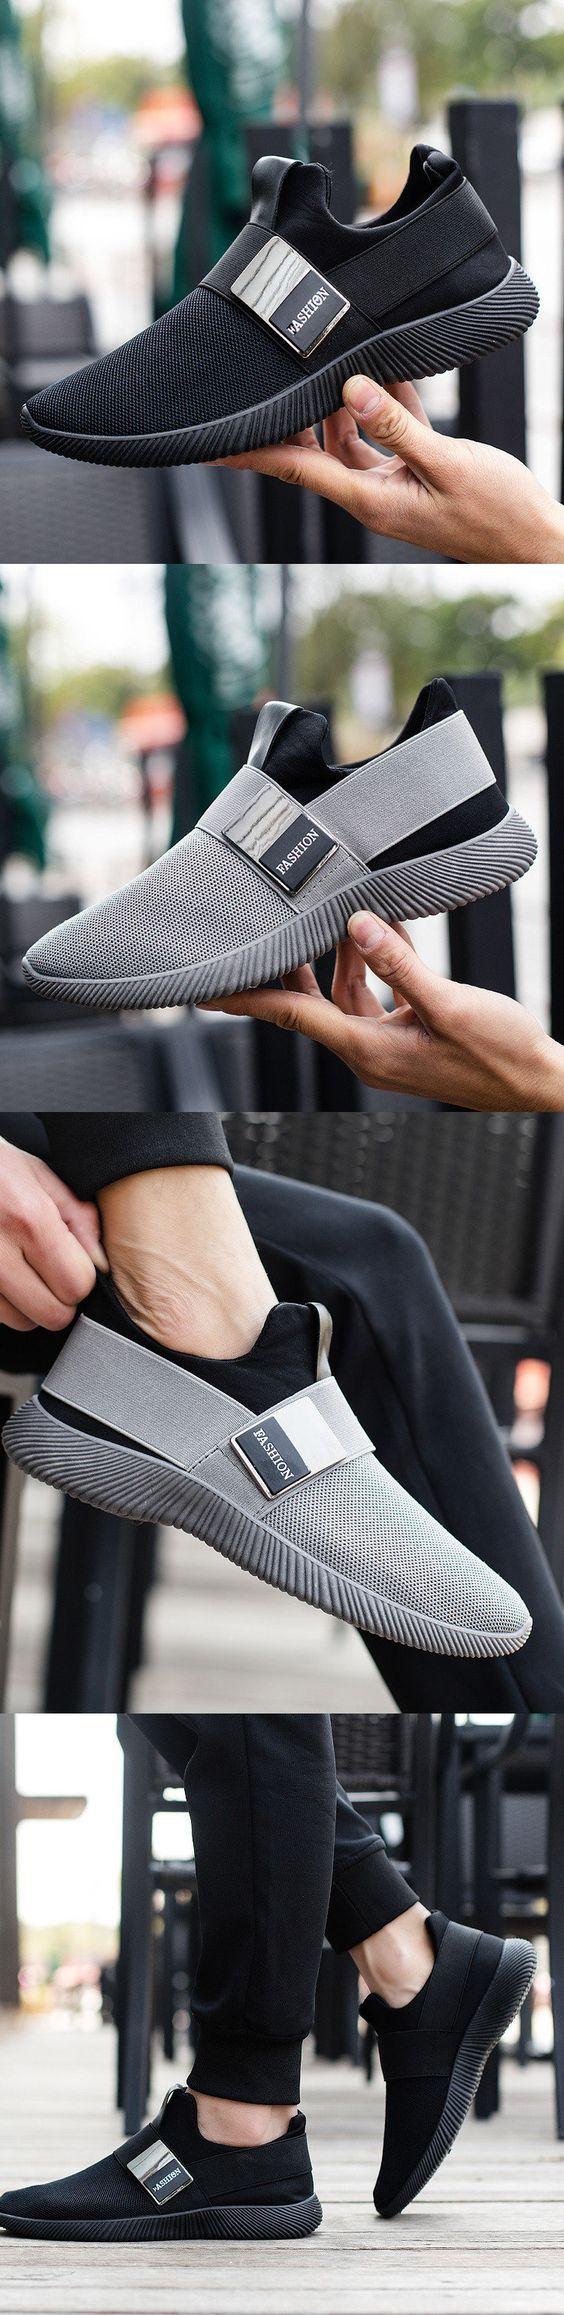 Men Stretch Mesh Fabric Elastic Panels Metal Decoration Sport Running Sneakers